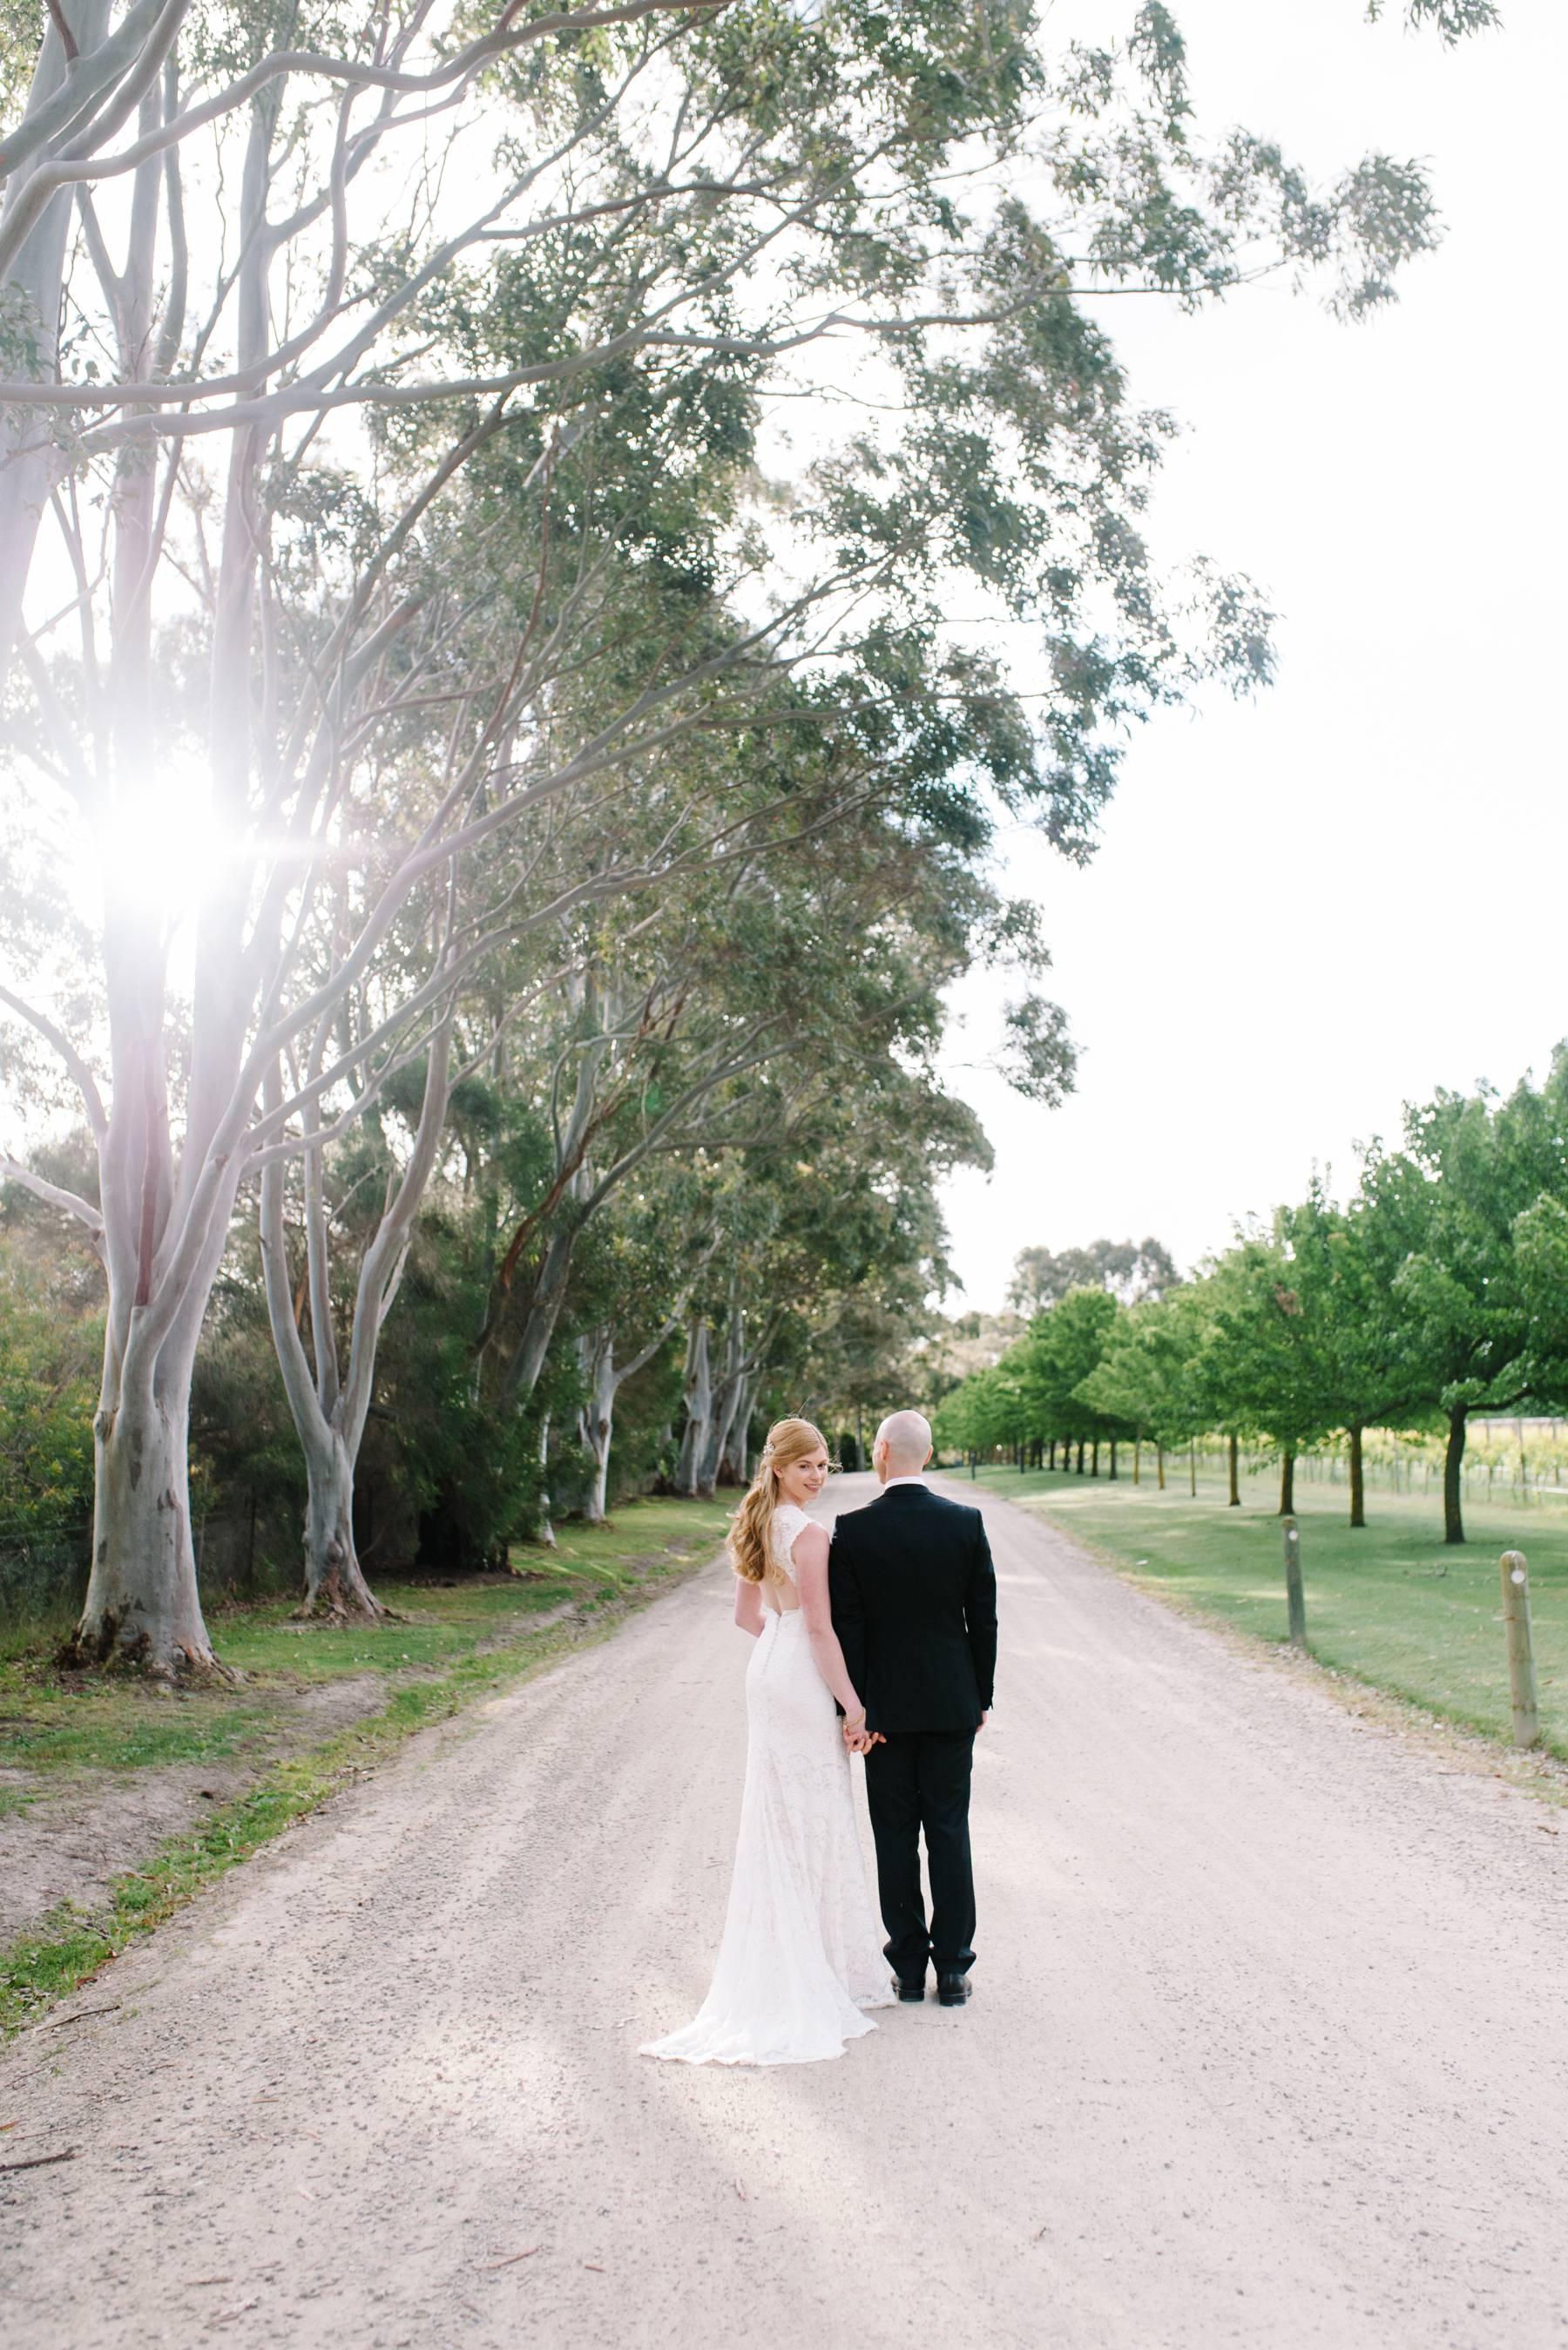 Bride and groom at Stillwater at Crittenden by Michelle Pragt